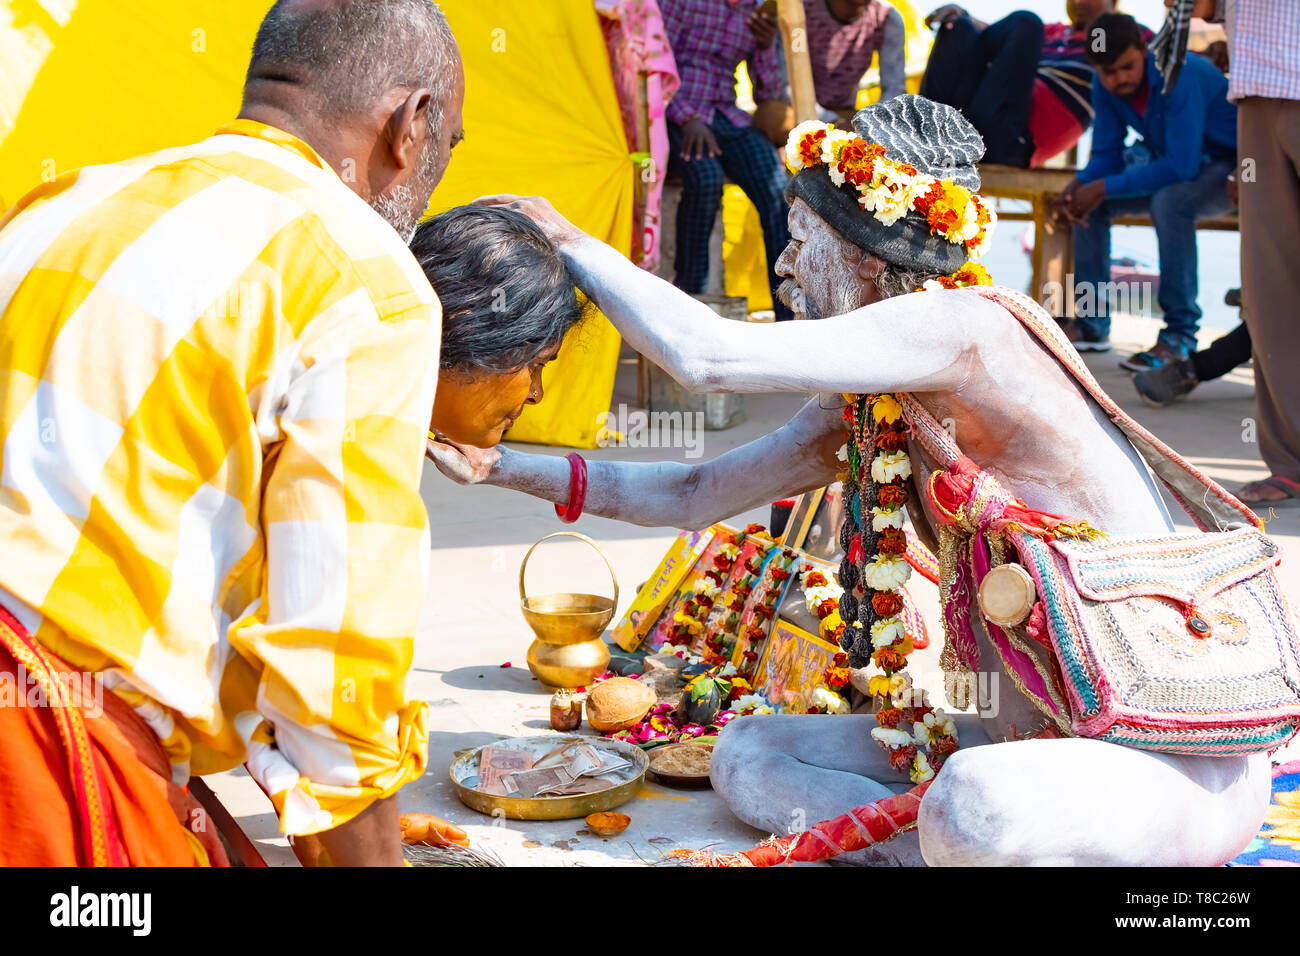 VARANASI, INDIA, MAR 10, 2019 - Unidentified Hindu Sadhu holy man, sits on the ghat near the Ganges river in Varanasi, India. - Stock Image